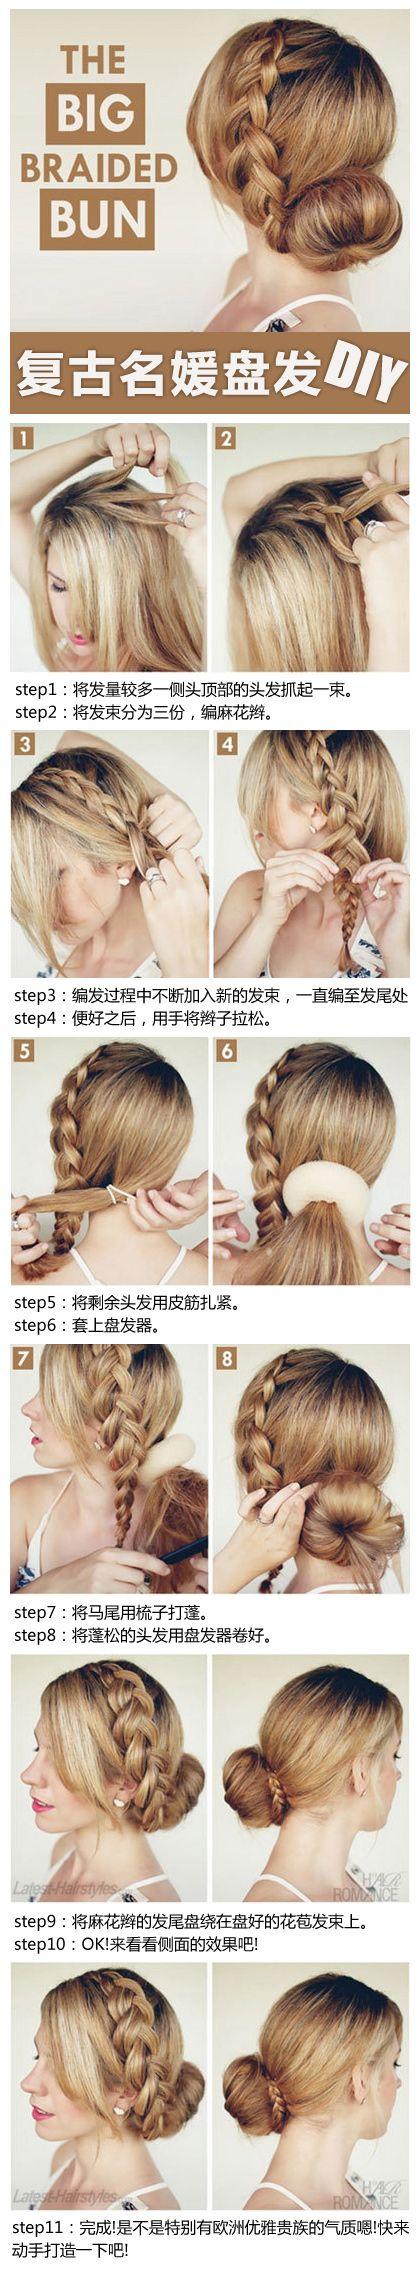 DIY Big Braided Bun Hairstyle